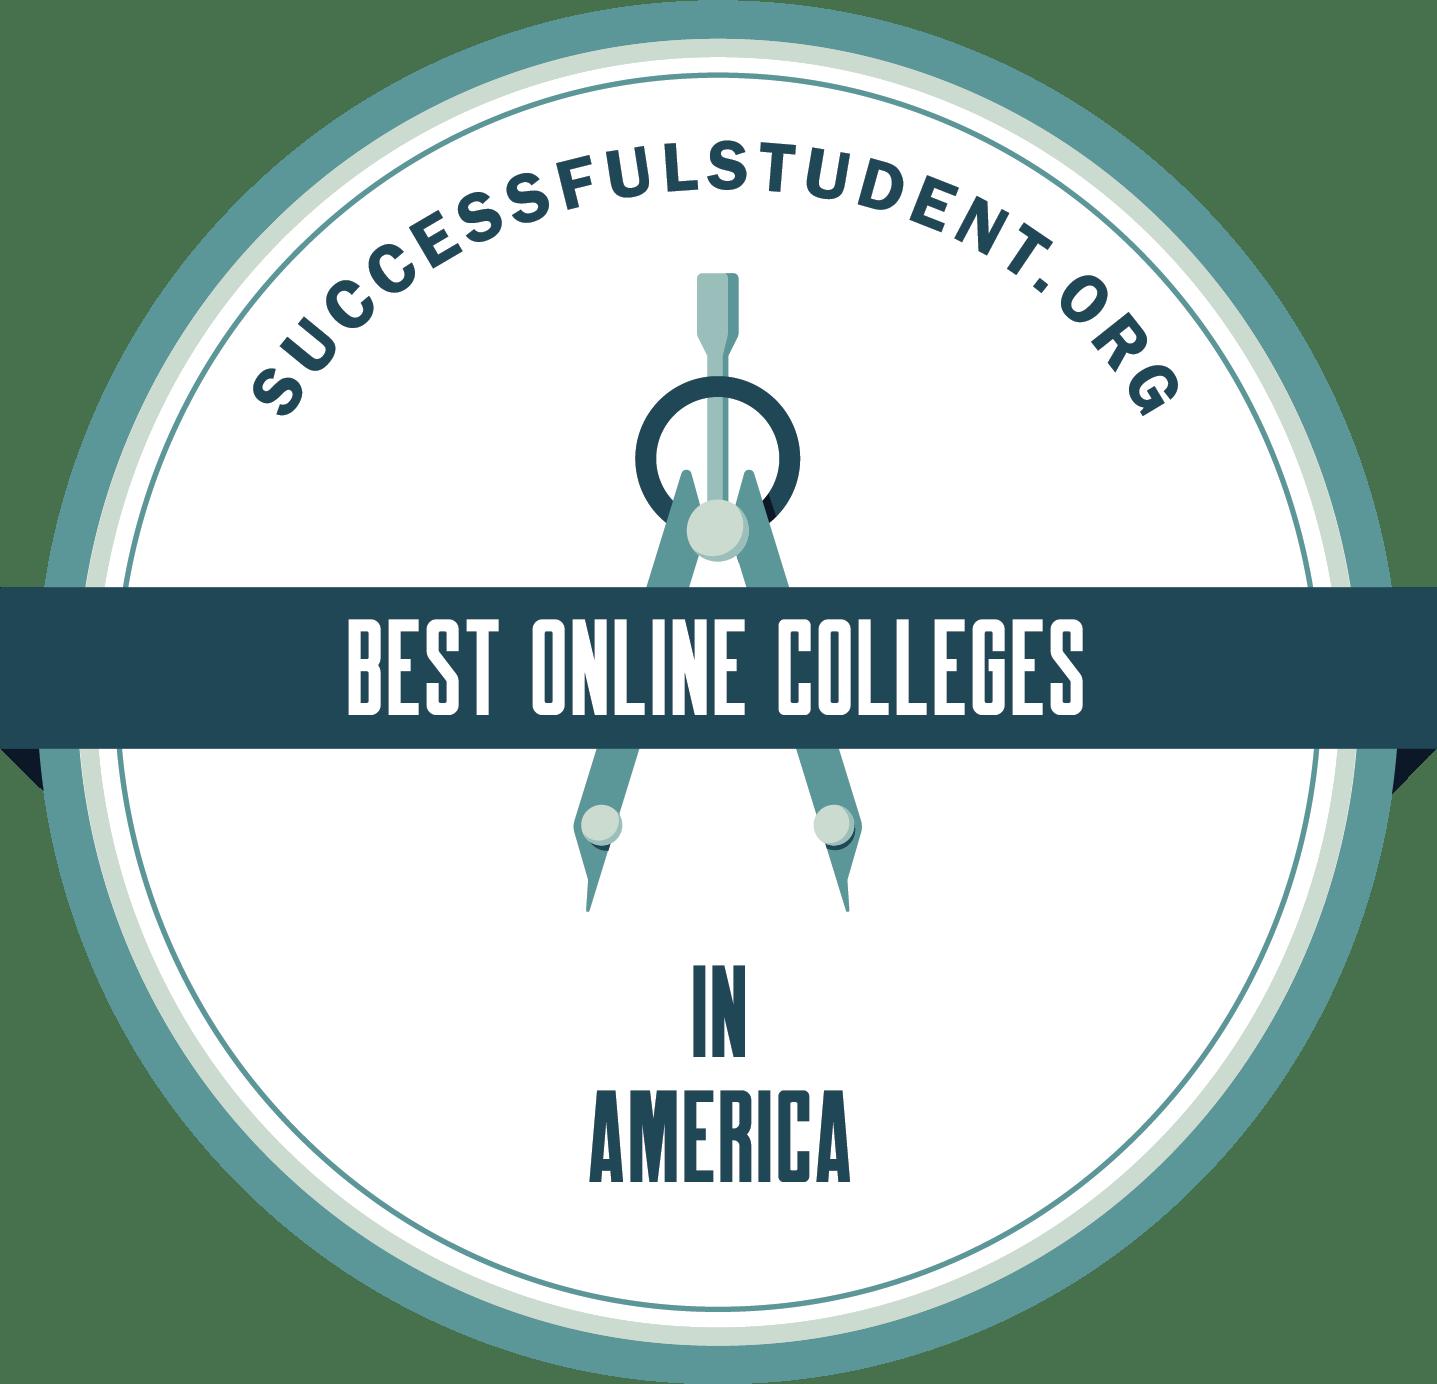 30 Best Online Colleges in America's Badge